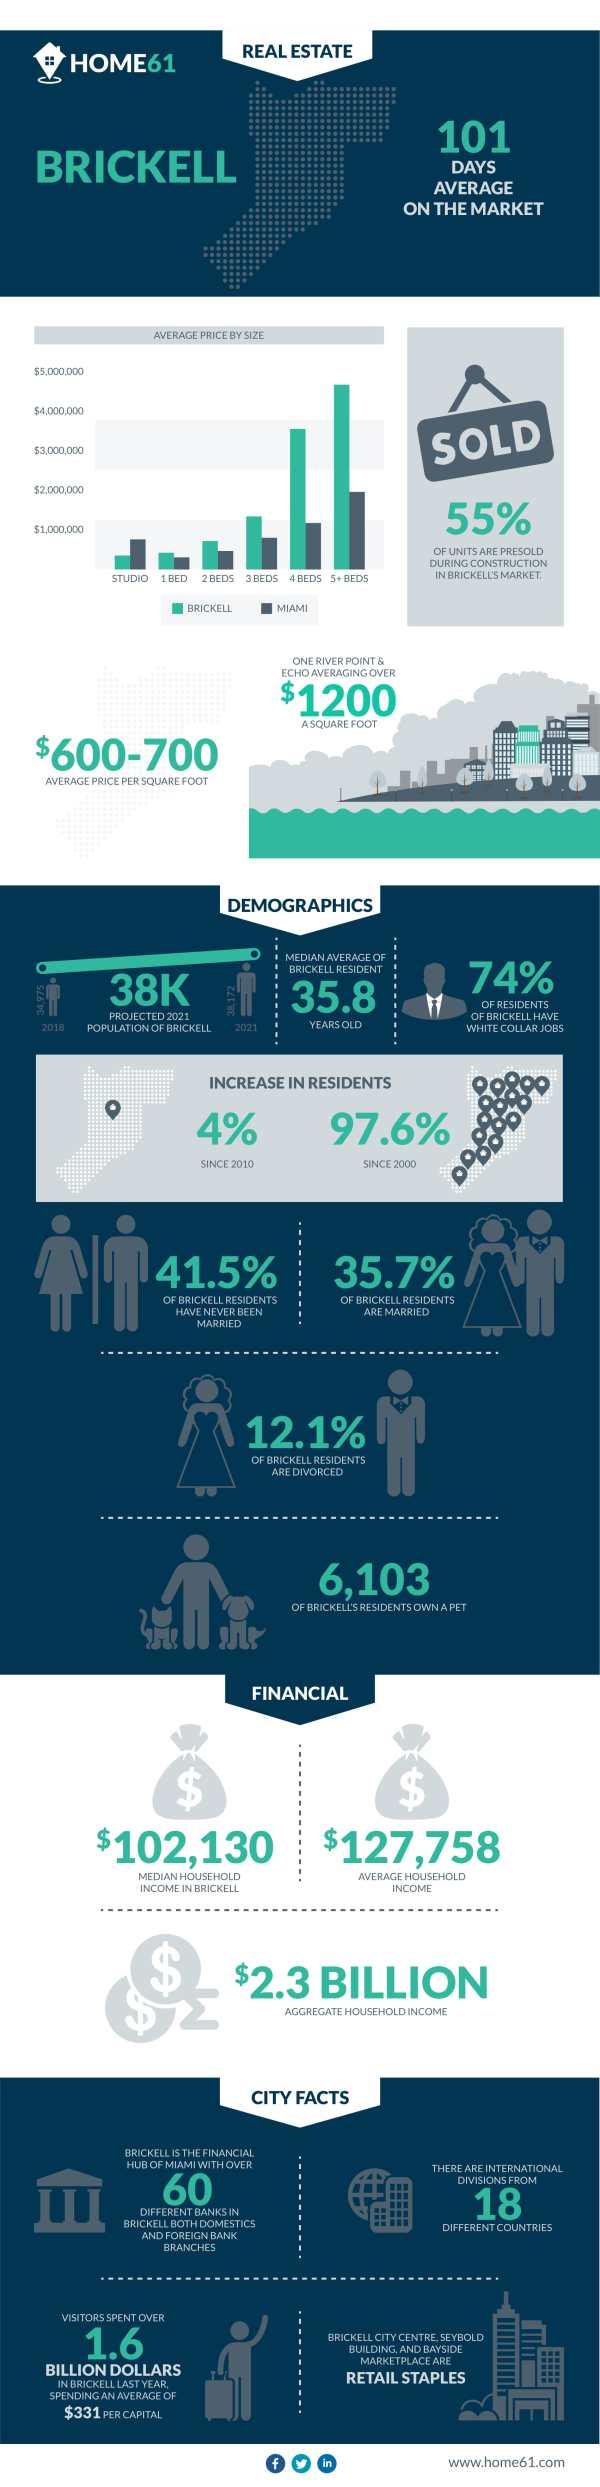 Brickell_Infographic-1